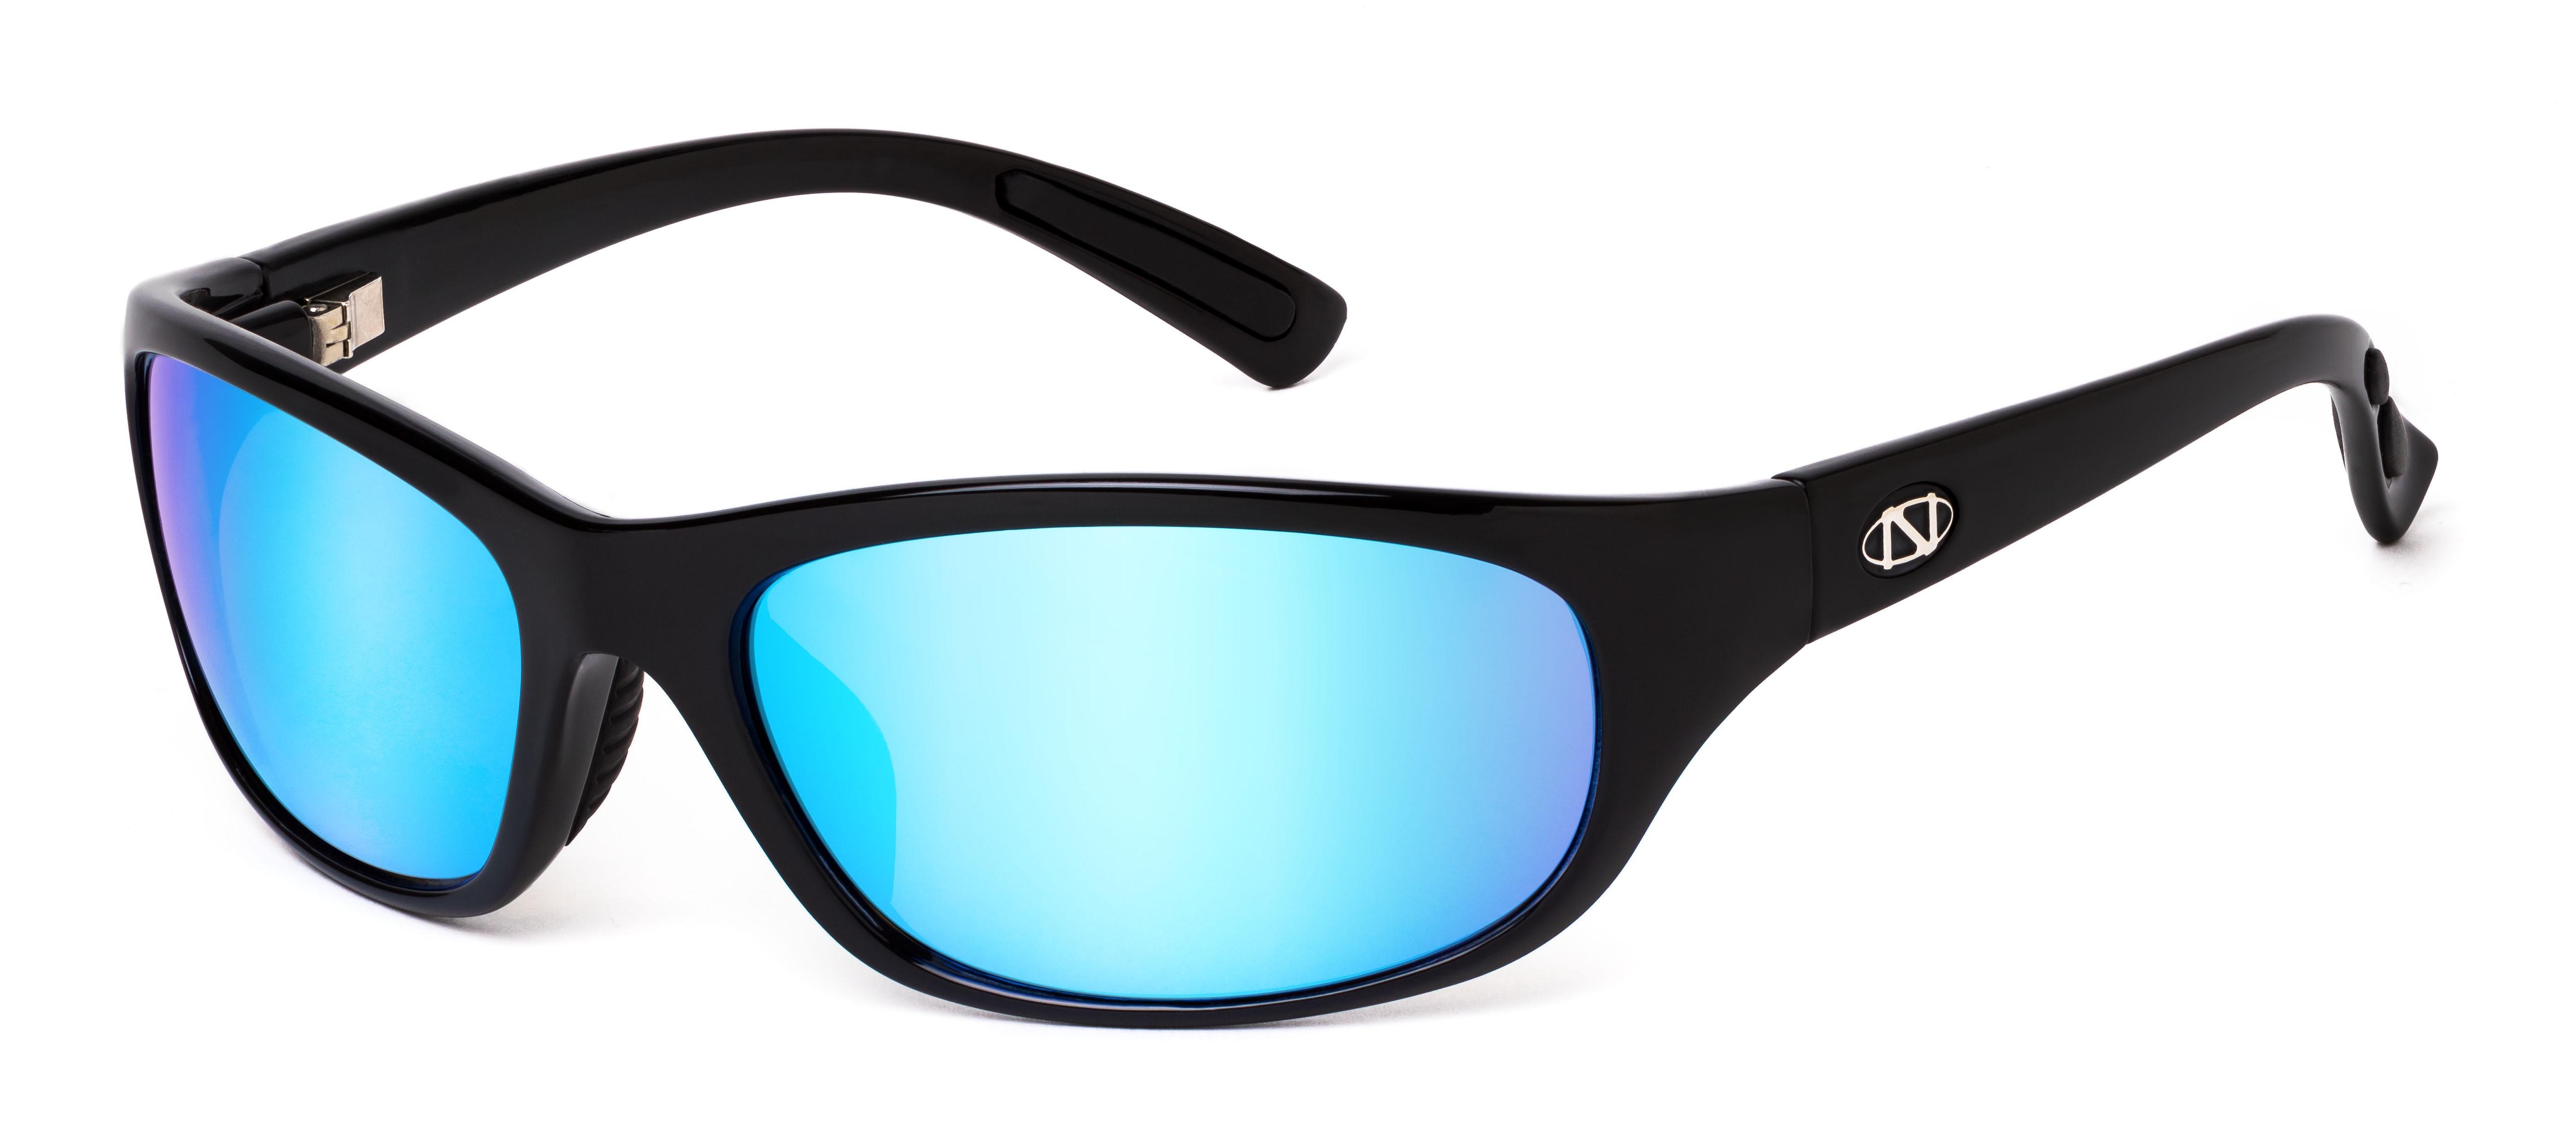 e003cce516 ONOS Carabelle Reading Sunglasses FREE S H 104BG175